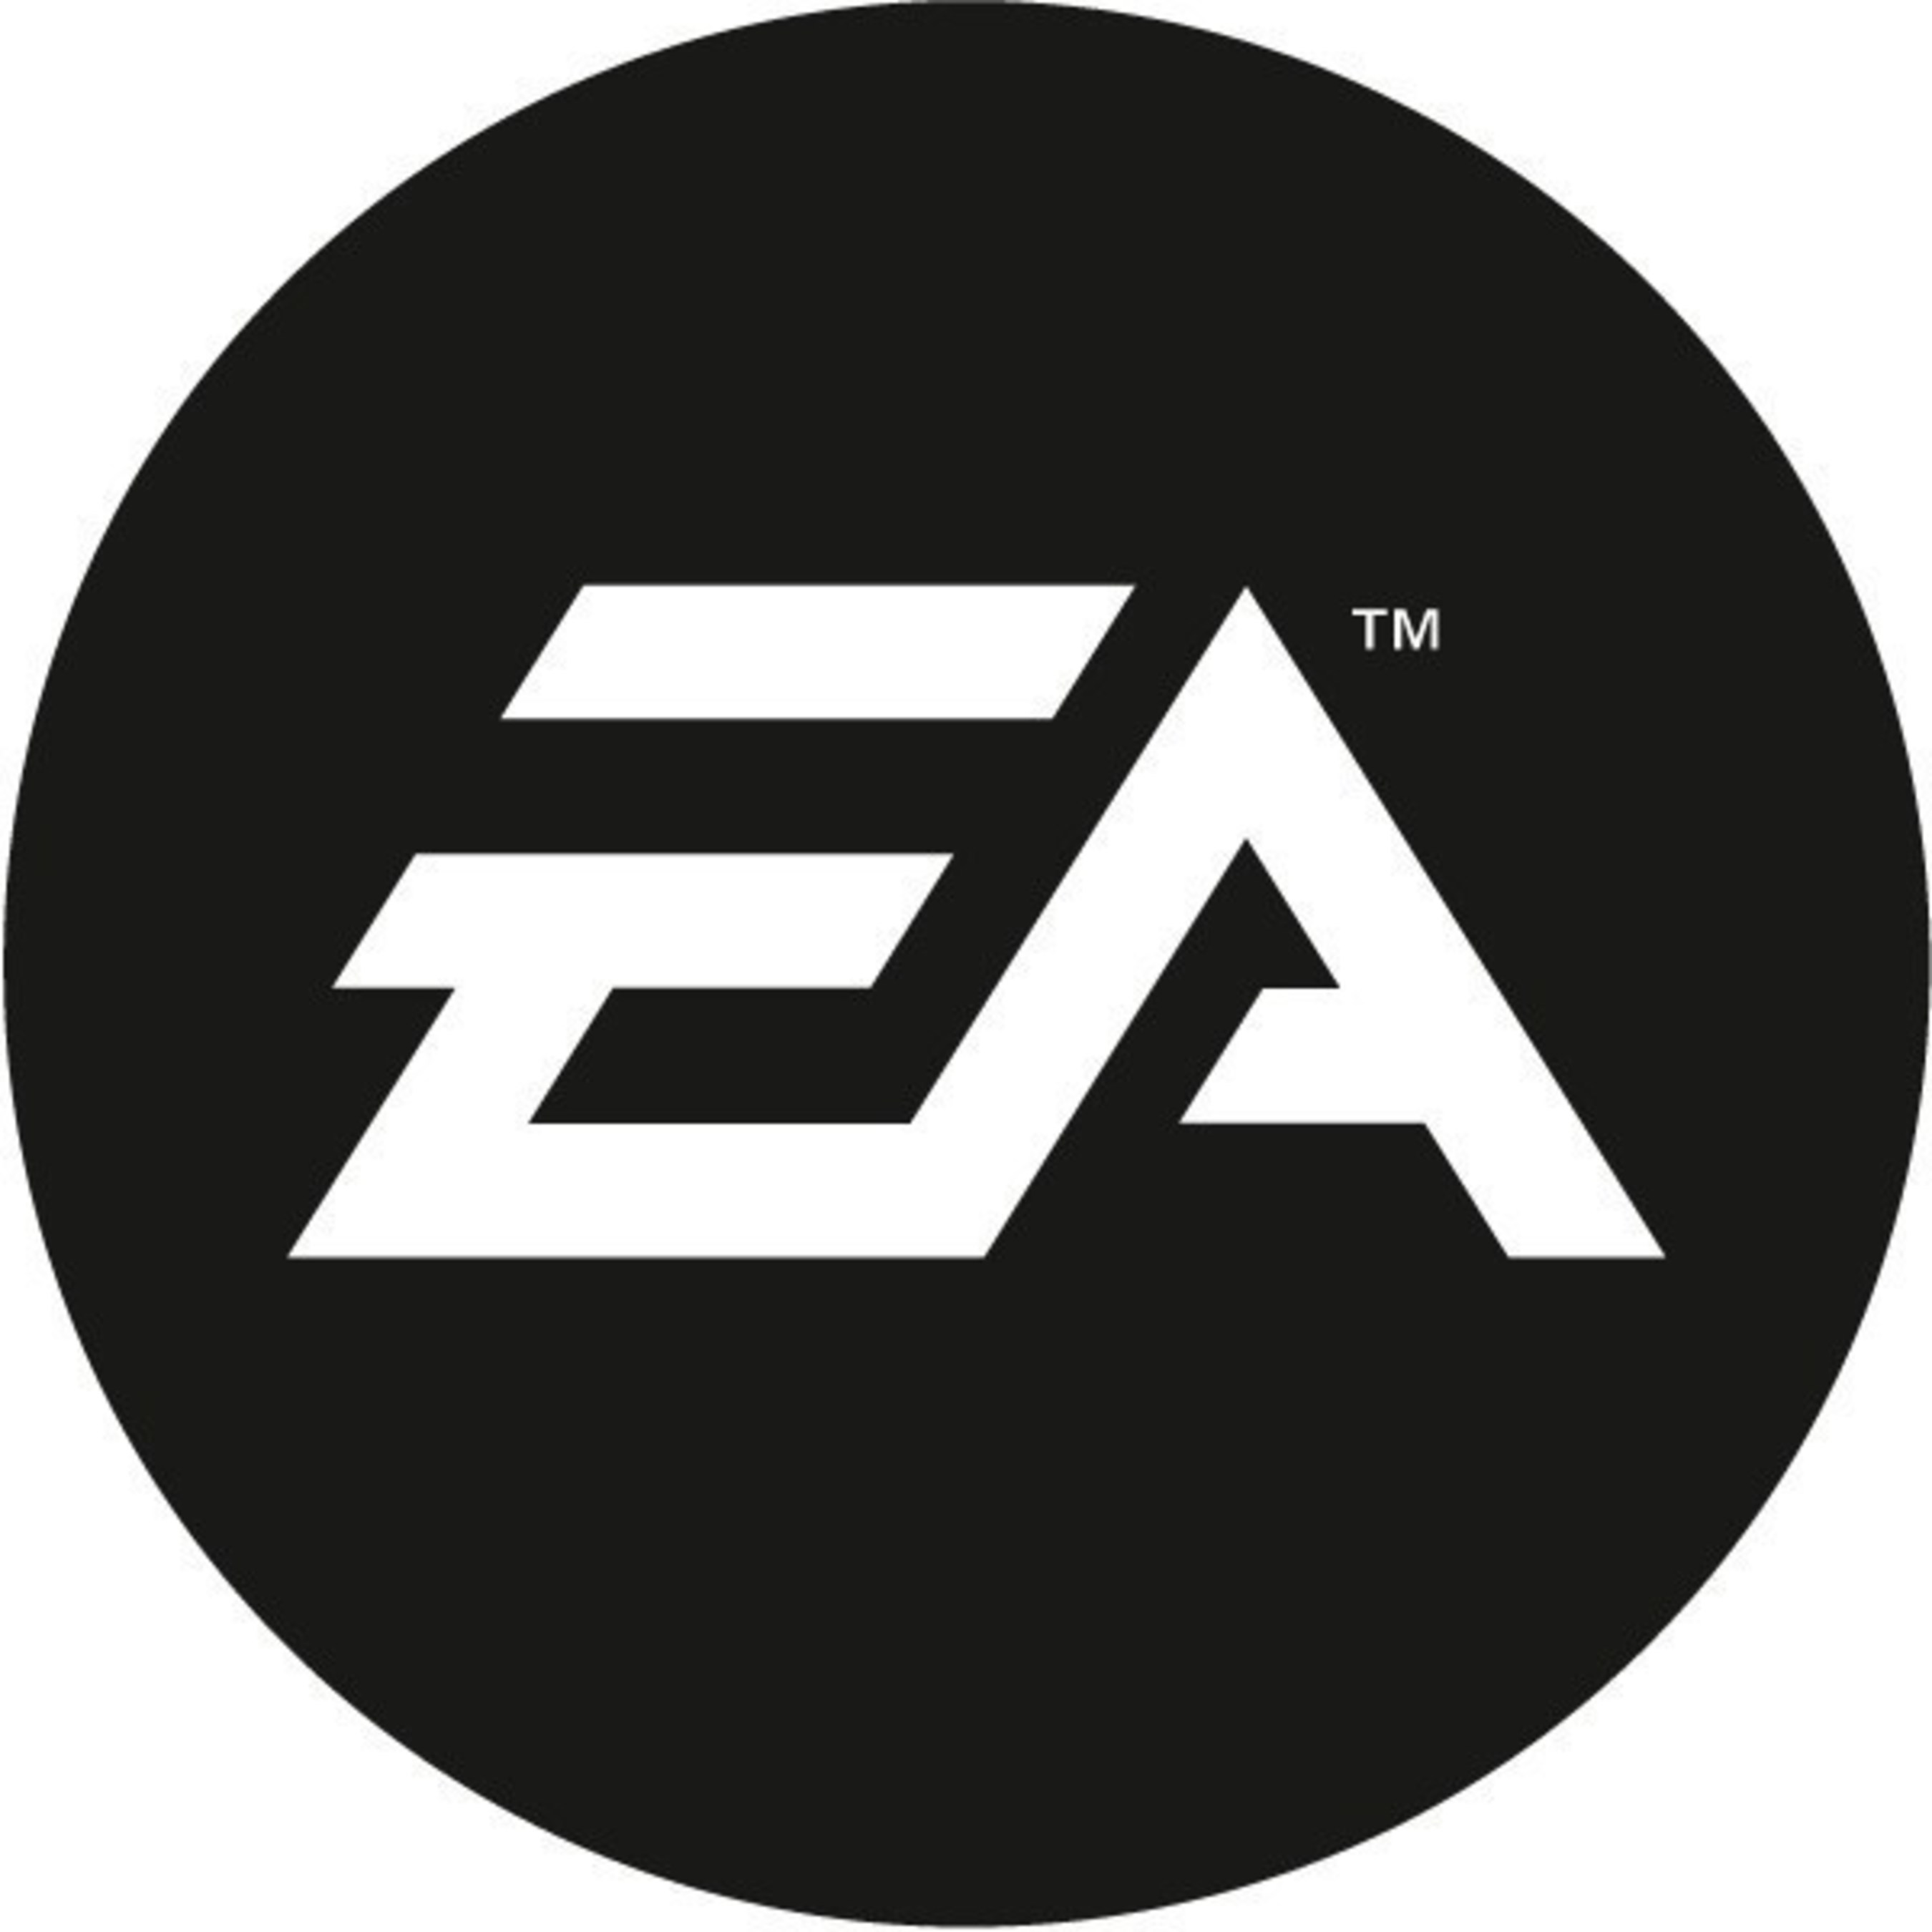 IMS Internet Media Services e Electronic Arts se unem para trabalhar com marcas que jogam para